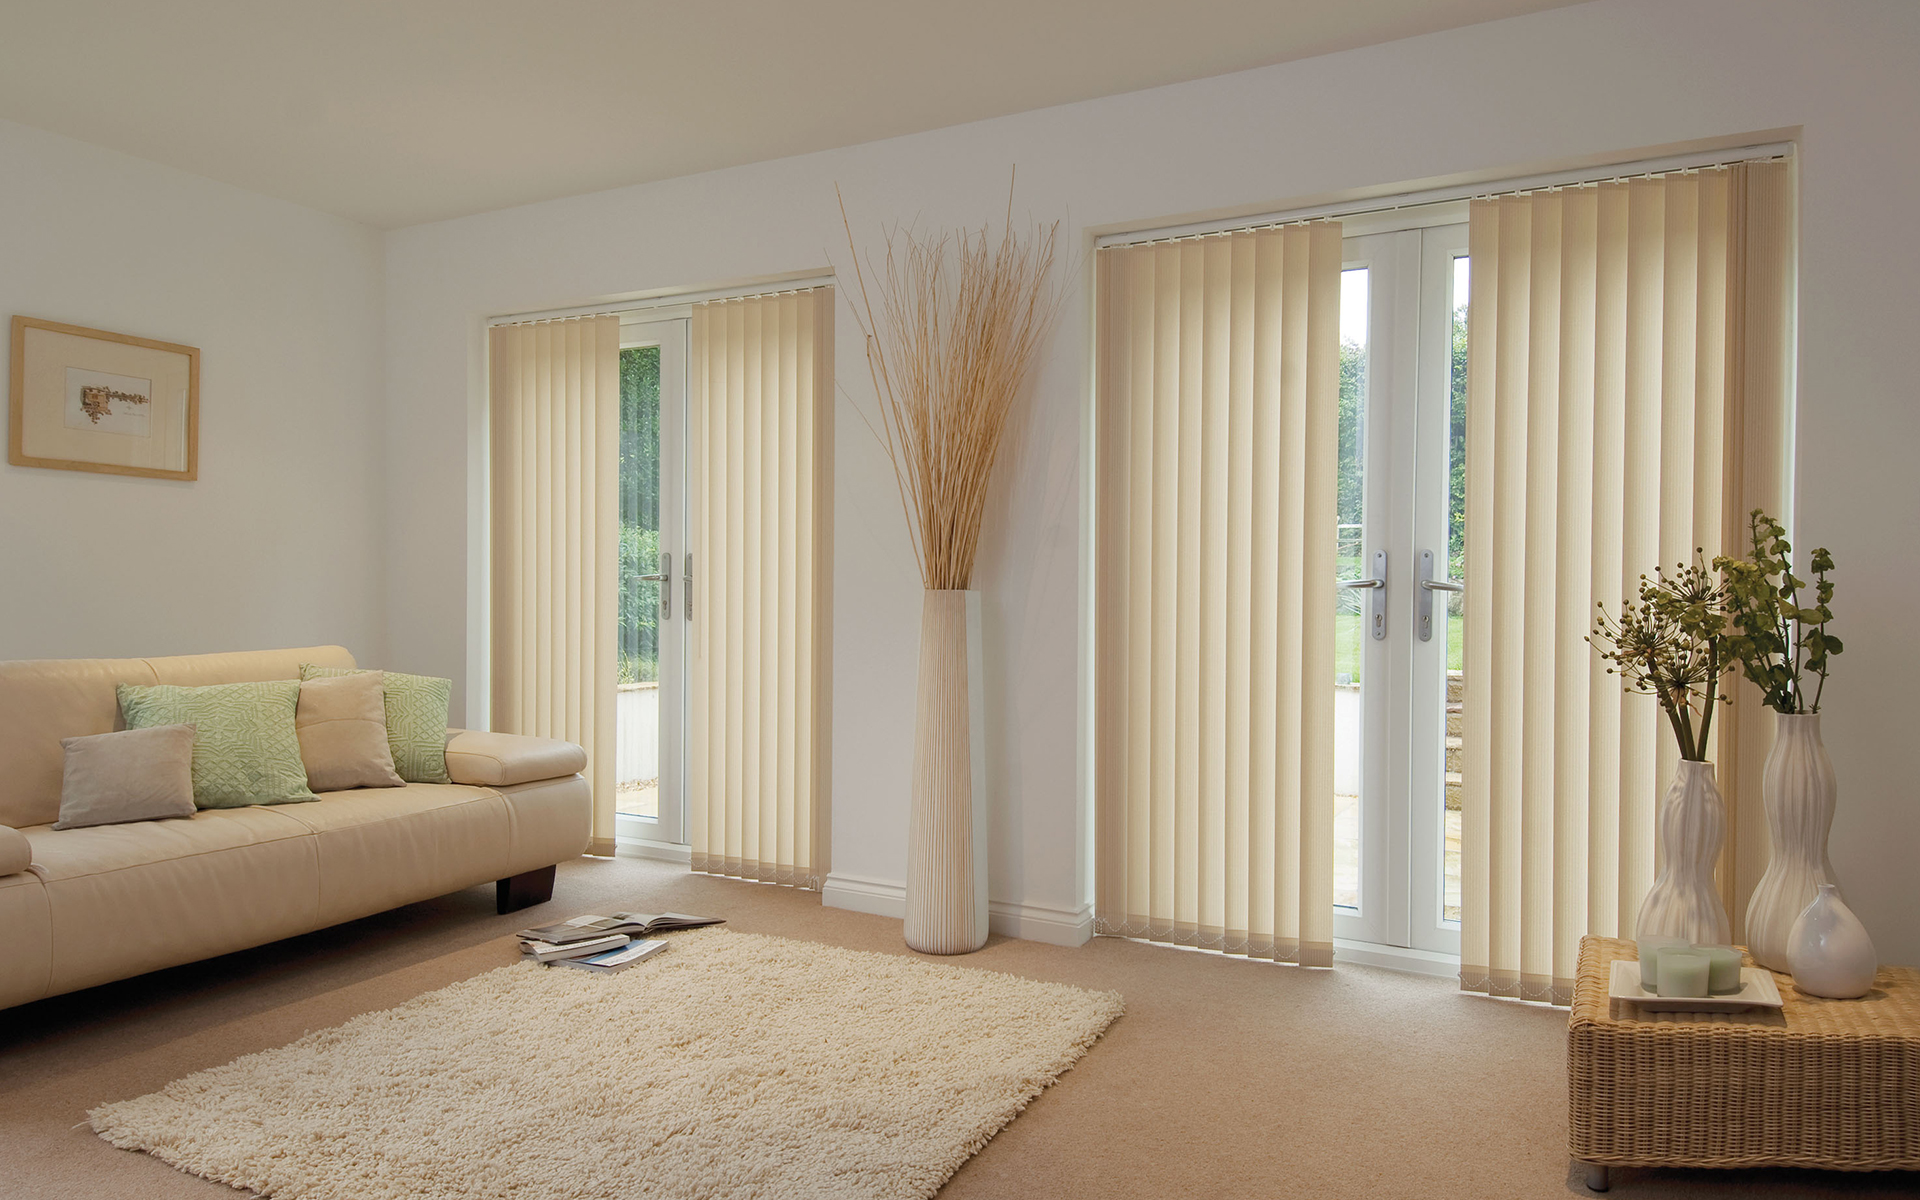 roller windows sunscreen blindsmax to sheer for archives floor blind levolor ideas ceiling blinds shades vertical graber drapes